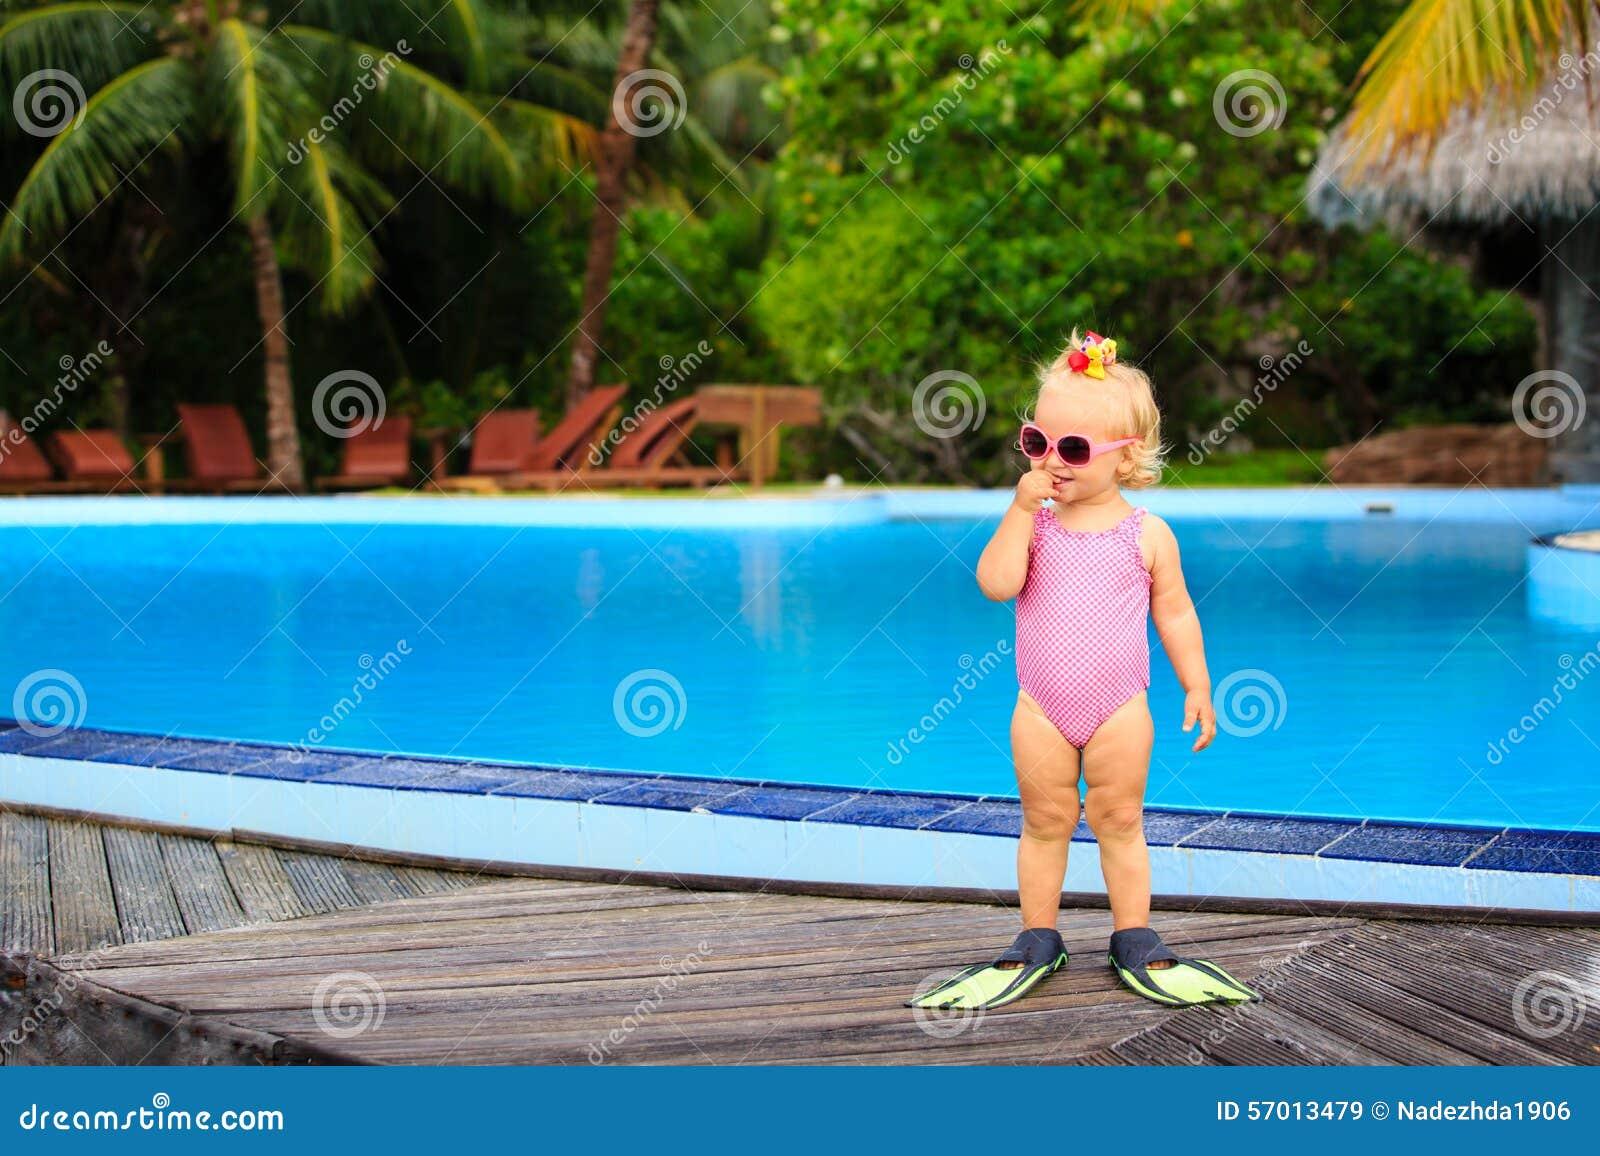 Consider, Sweet girls swim pool consider